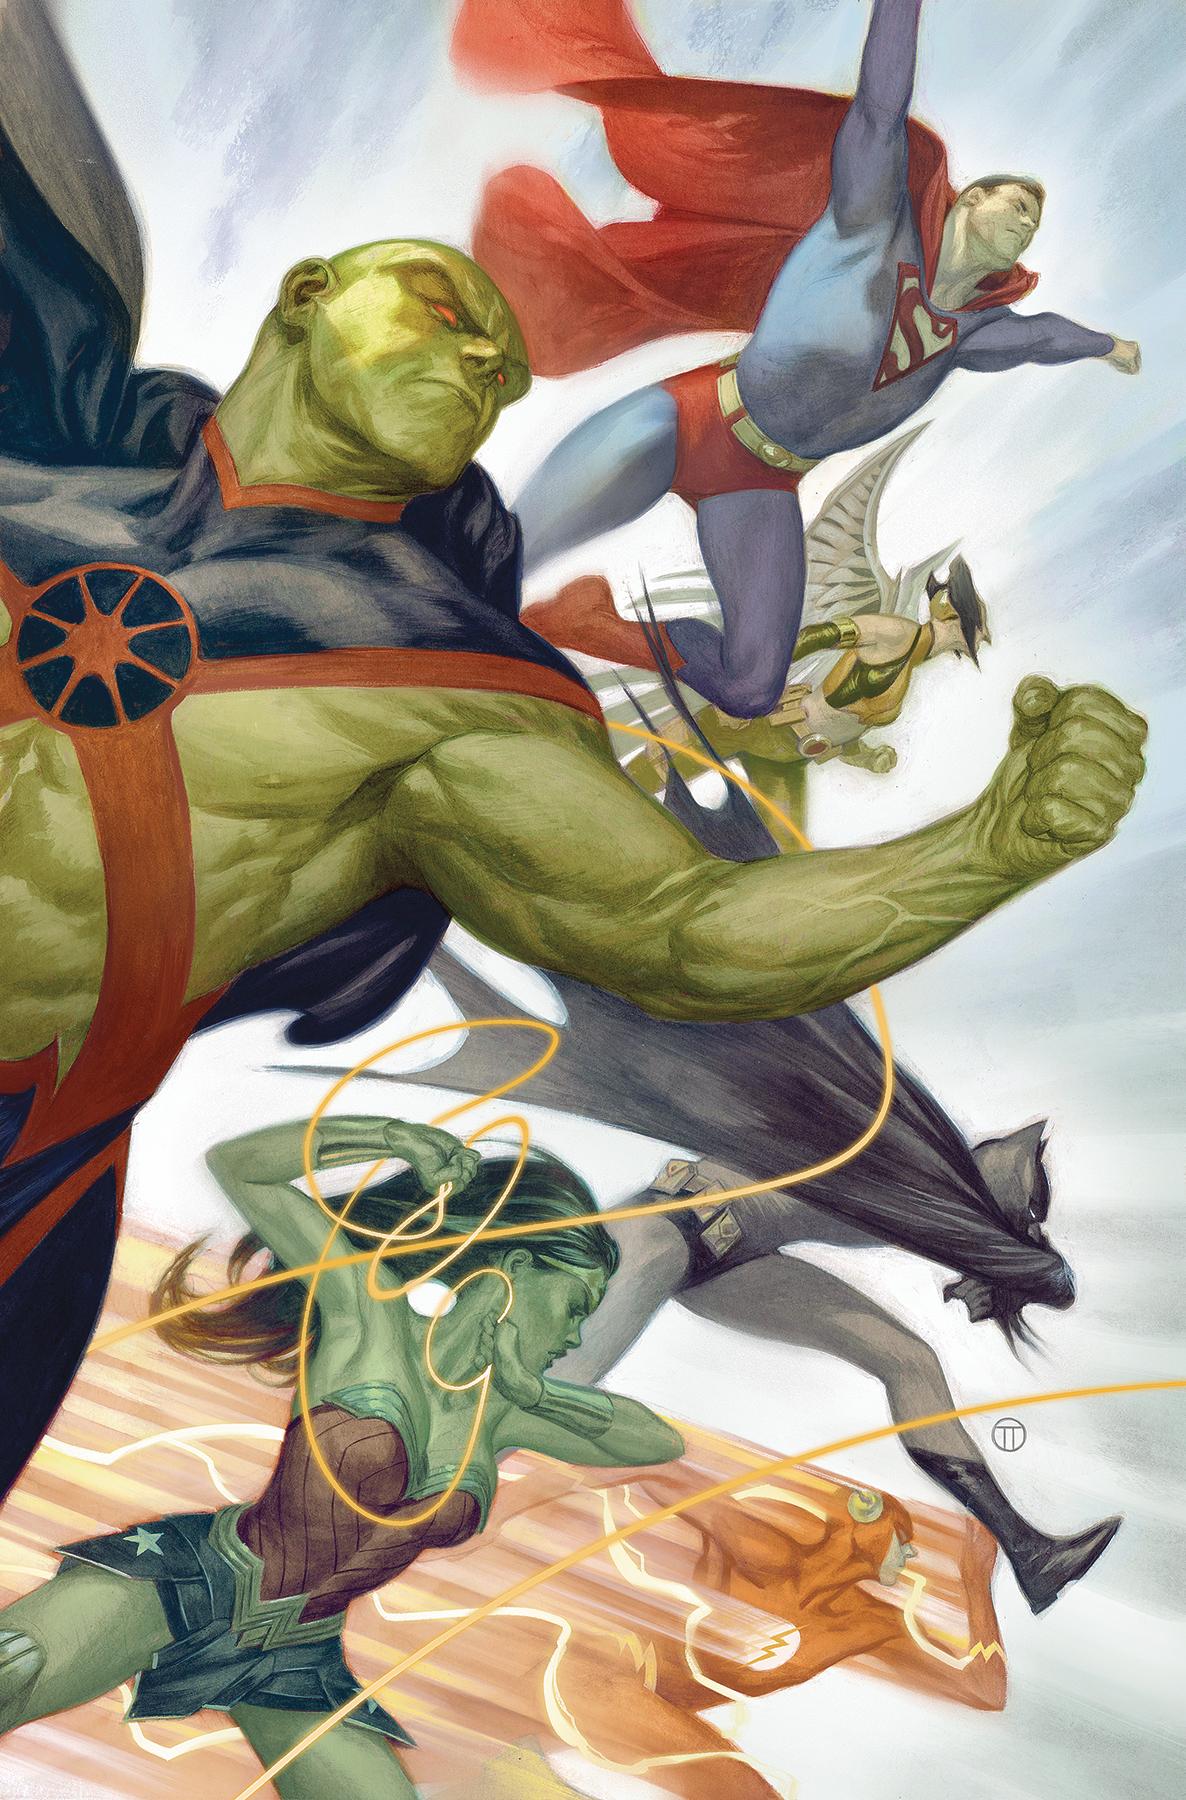 Justice League #31 Var Ed Yotv (STL130131) - Comics » Dc